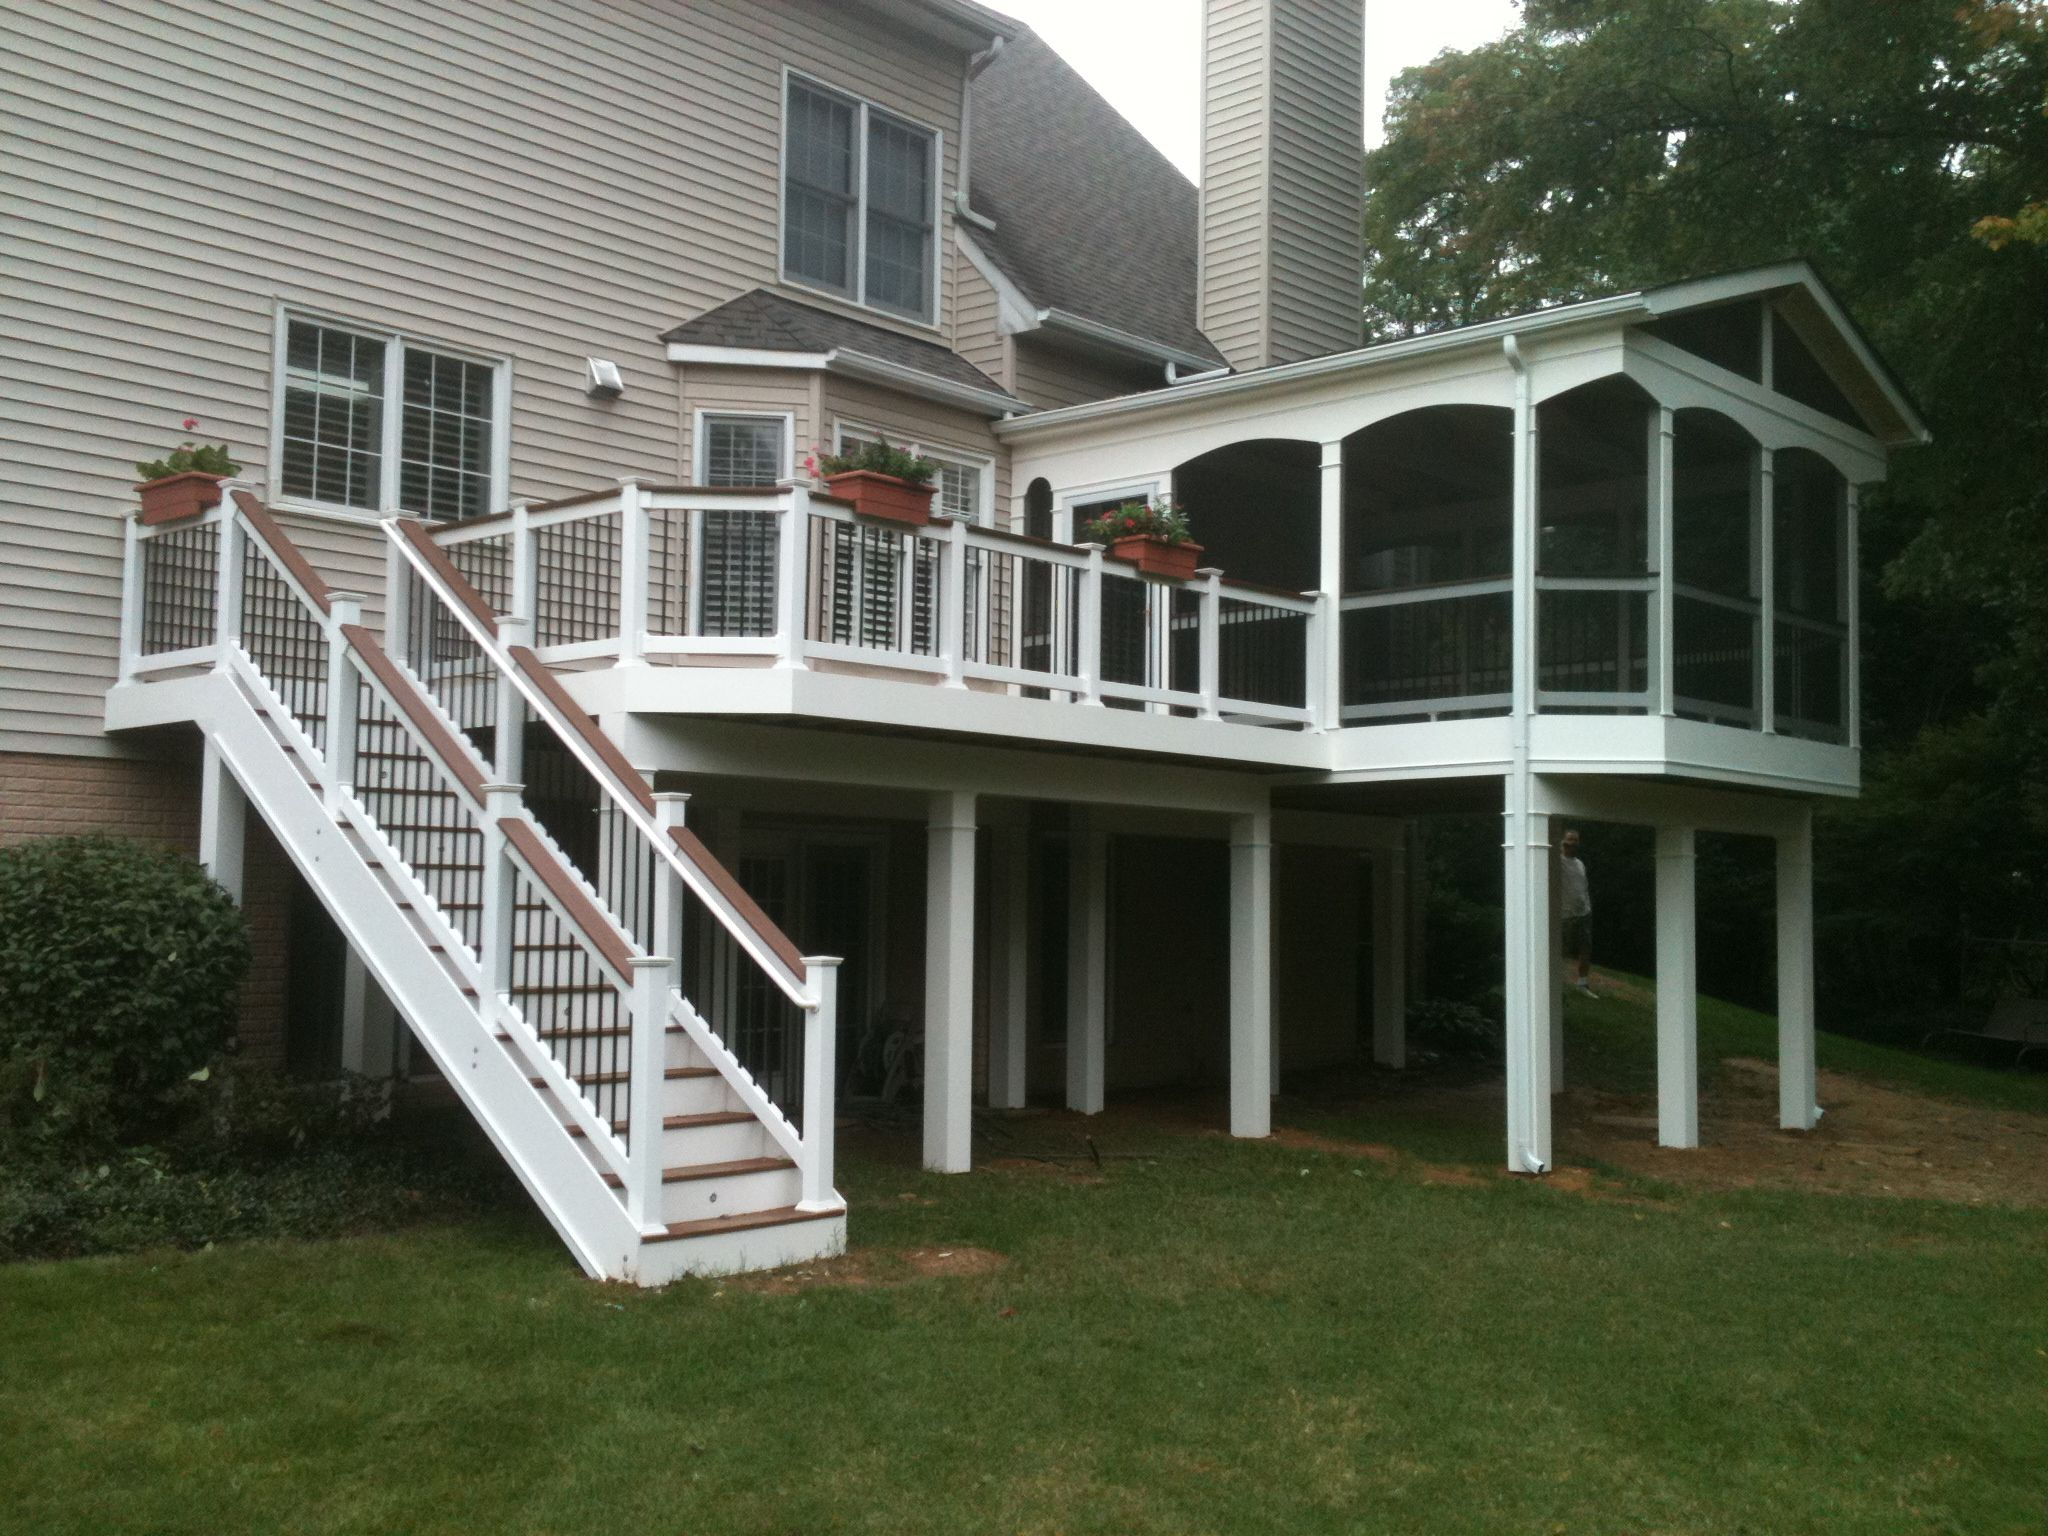 Annandale Deck And Porch Deck Designs Backyard Deck Builders